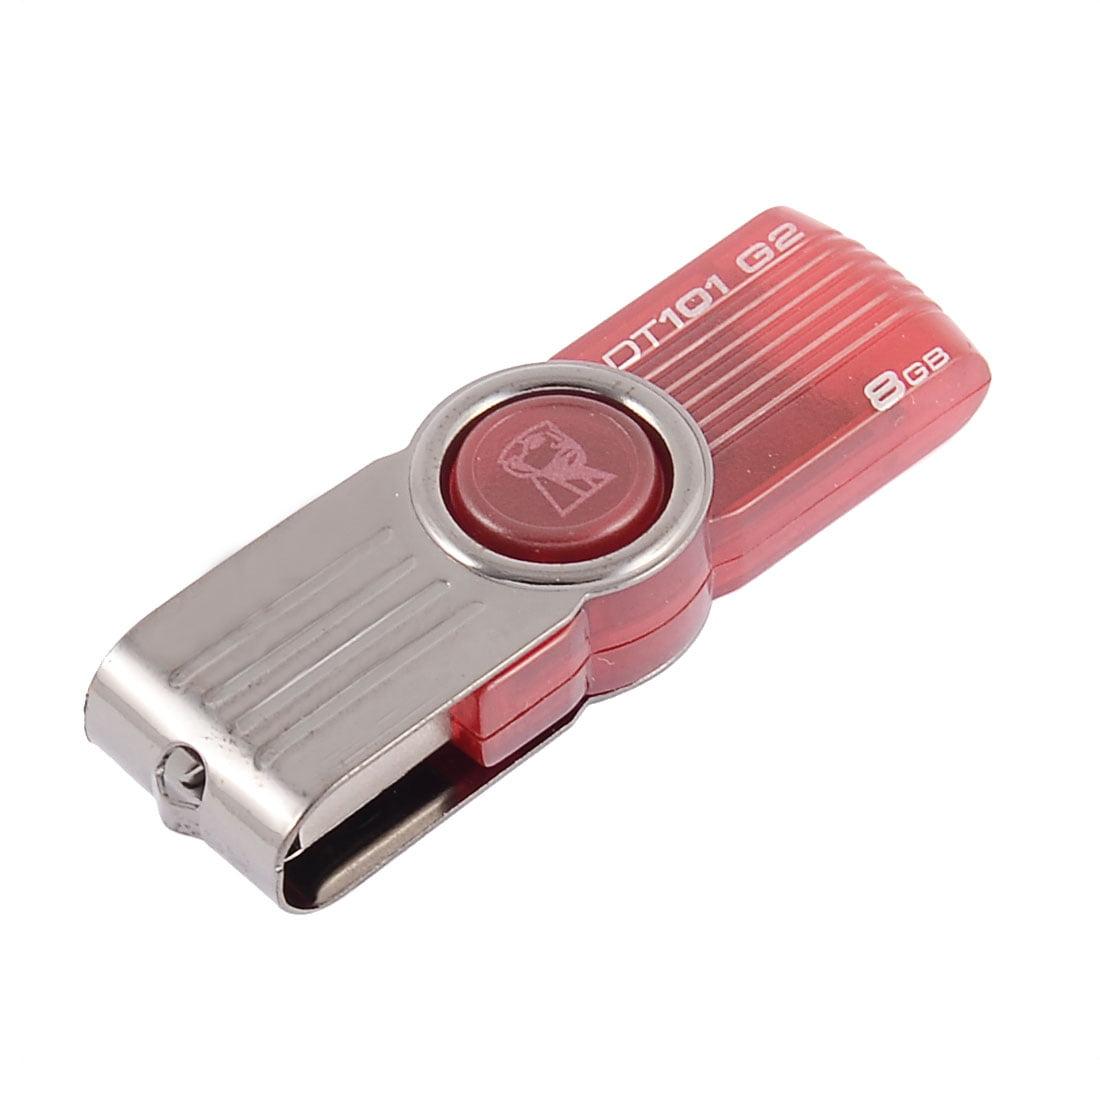 Rotating USB Flash Memory Pen Drive Storage Media U-Disk Red 8GB